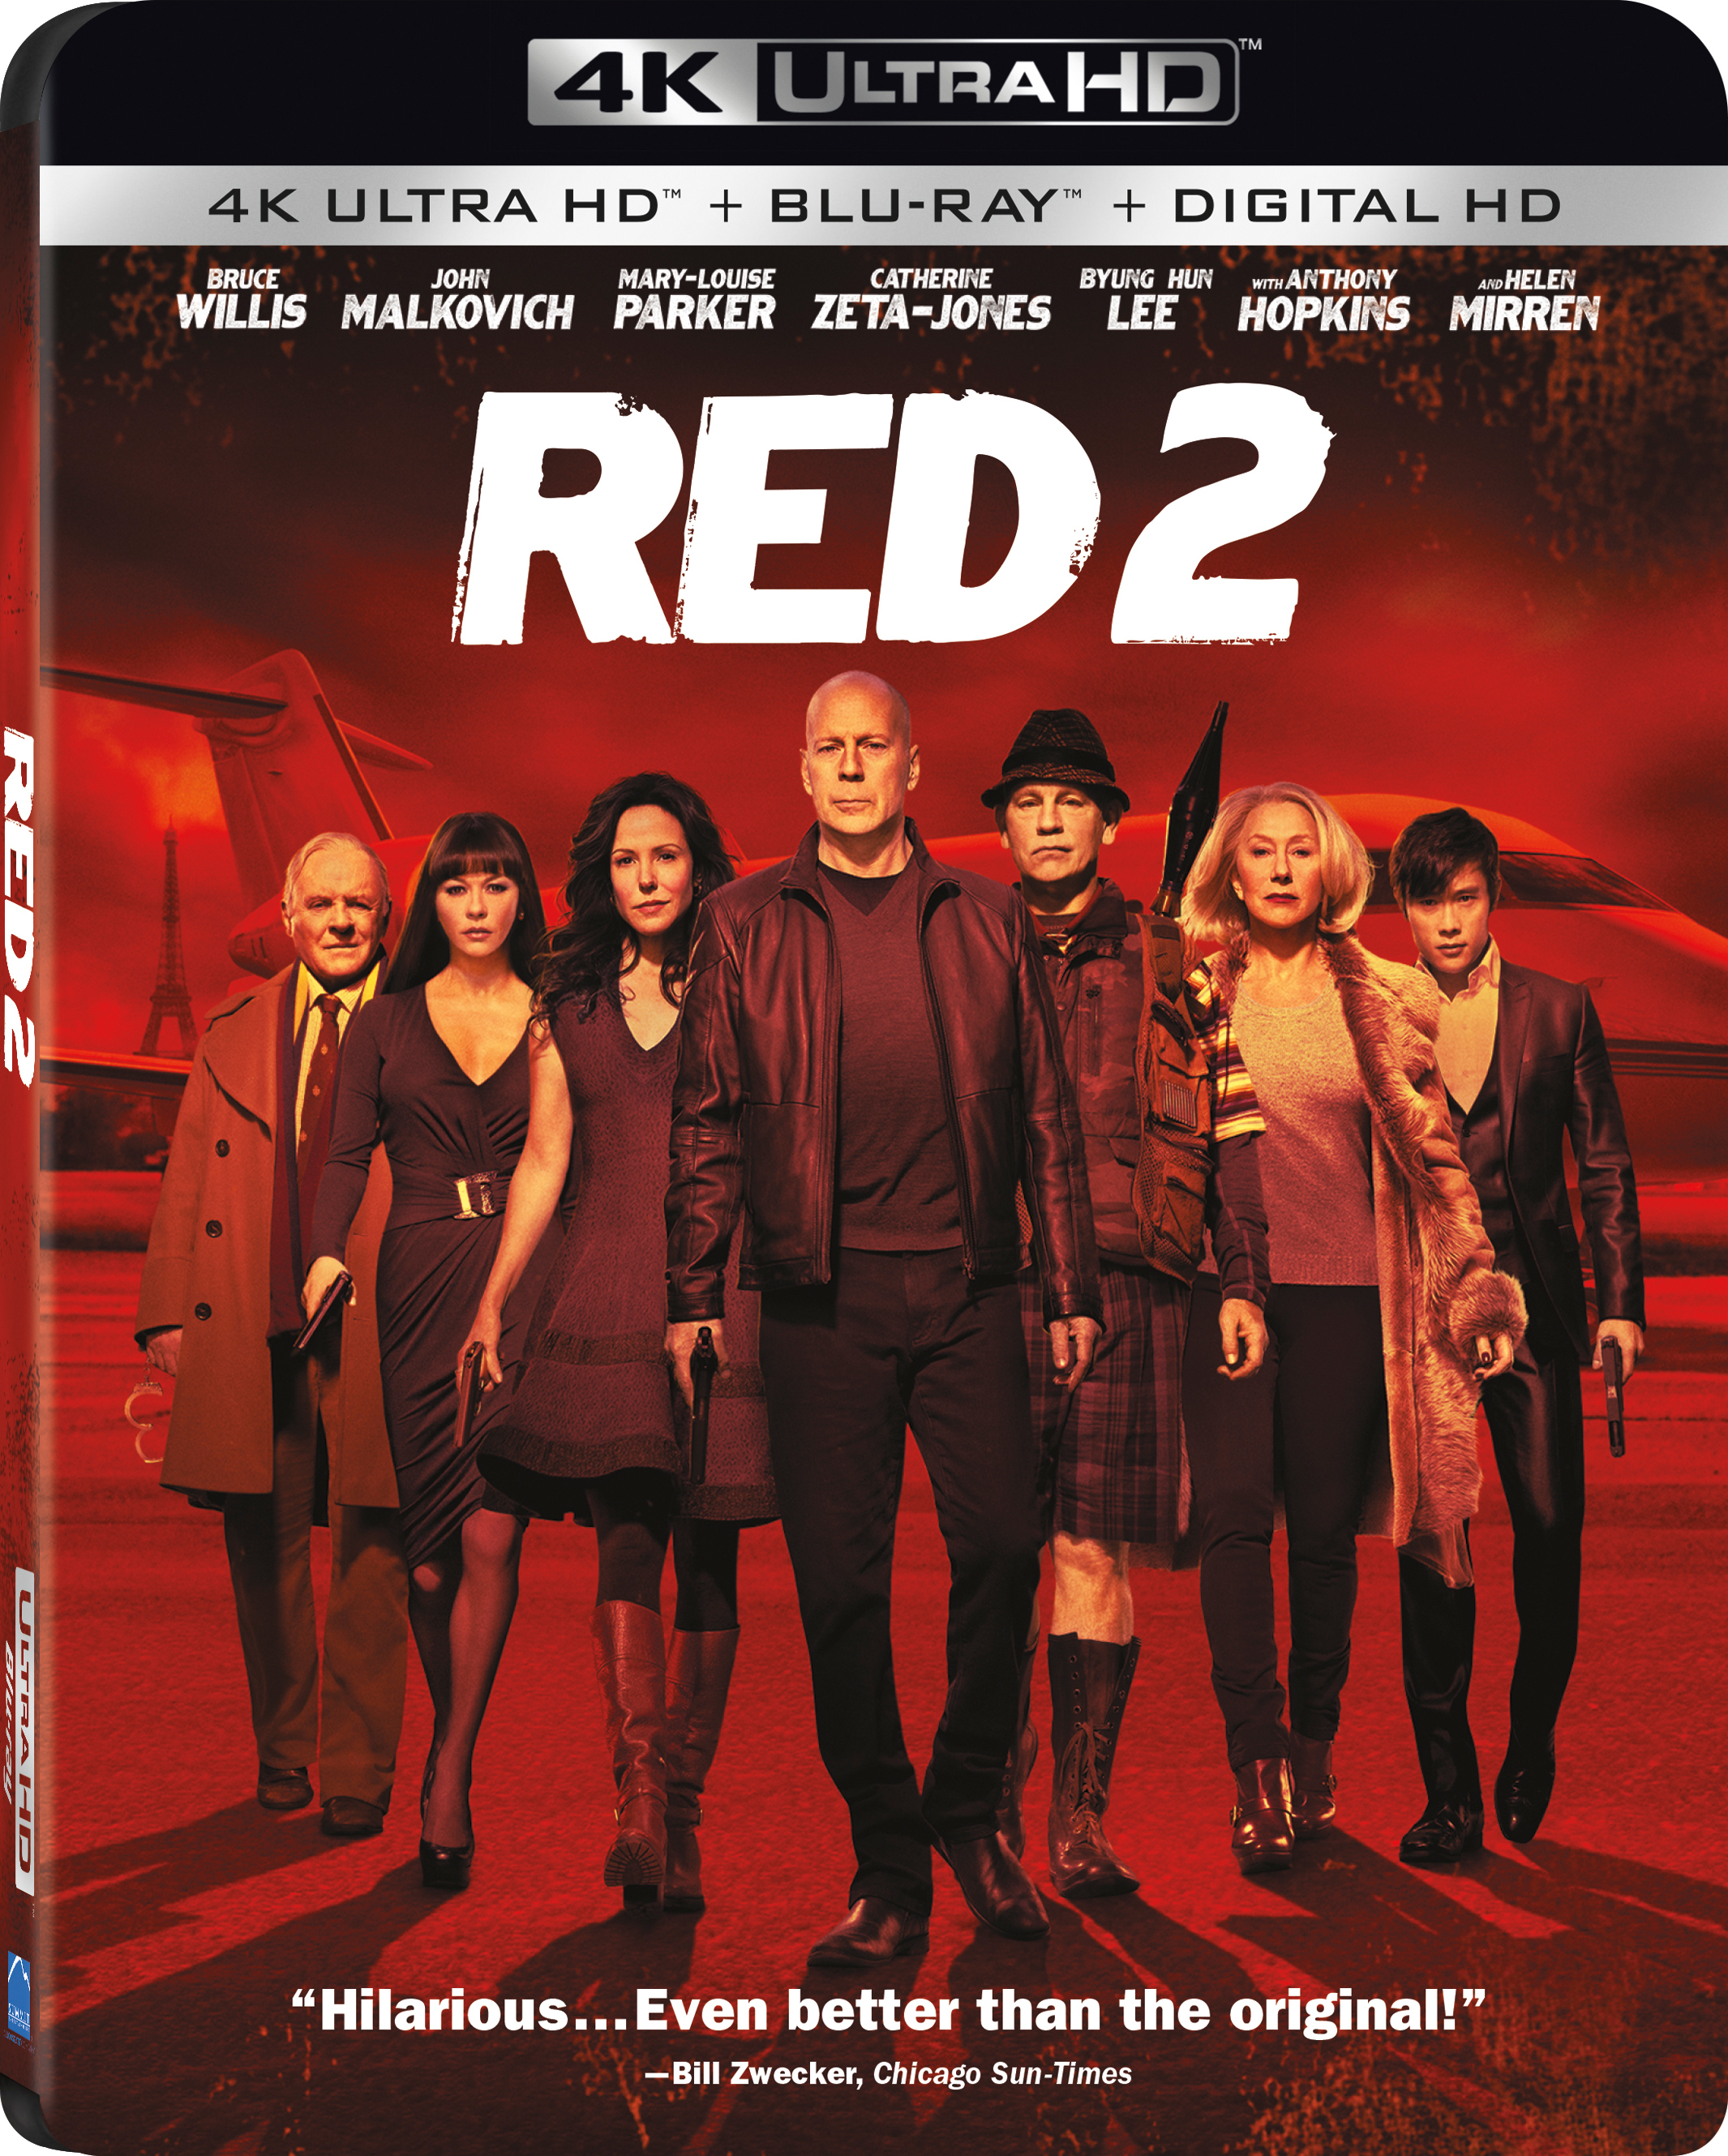 RED 2 (2013) 4K Ultra HD Blu-ray